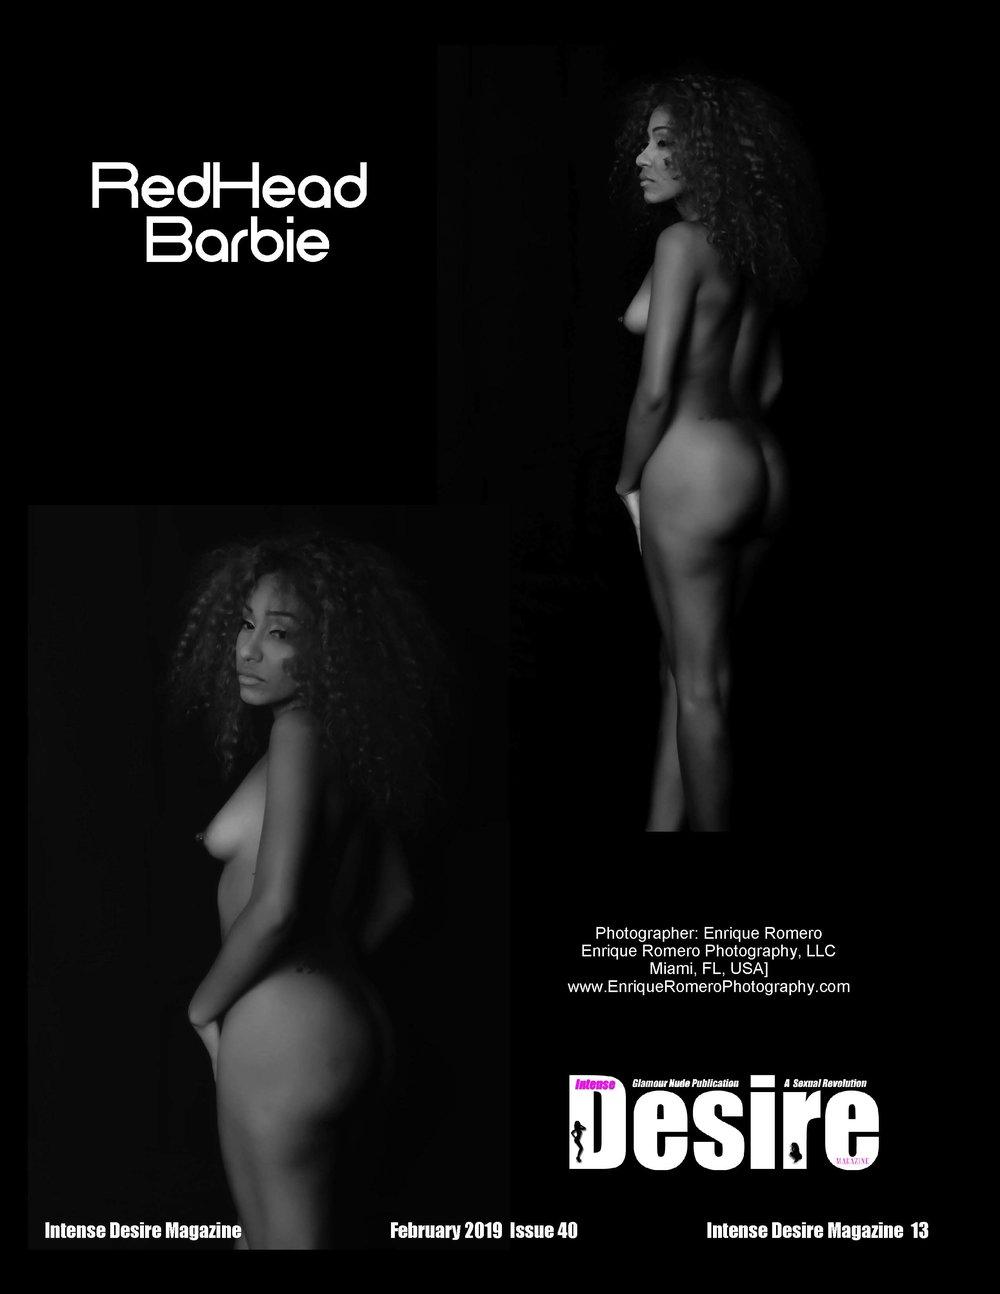 Cover Model RedHead Barbie